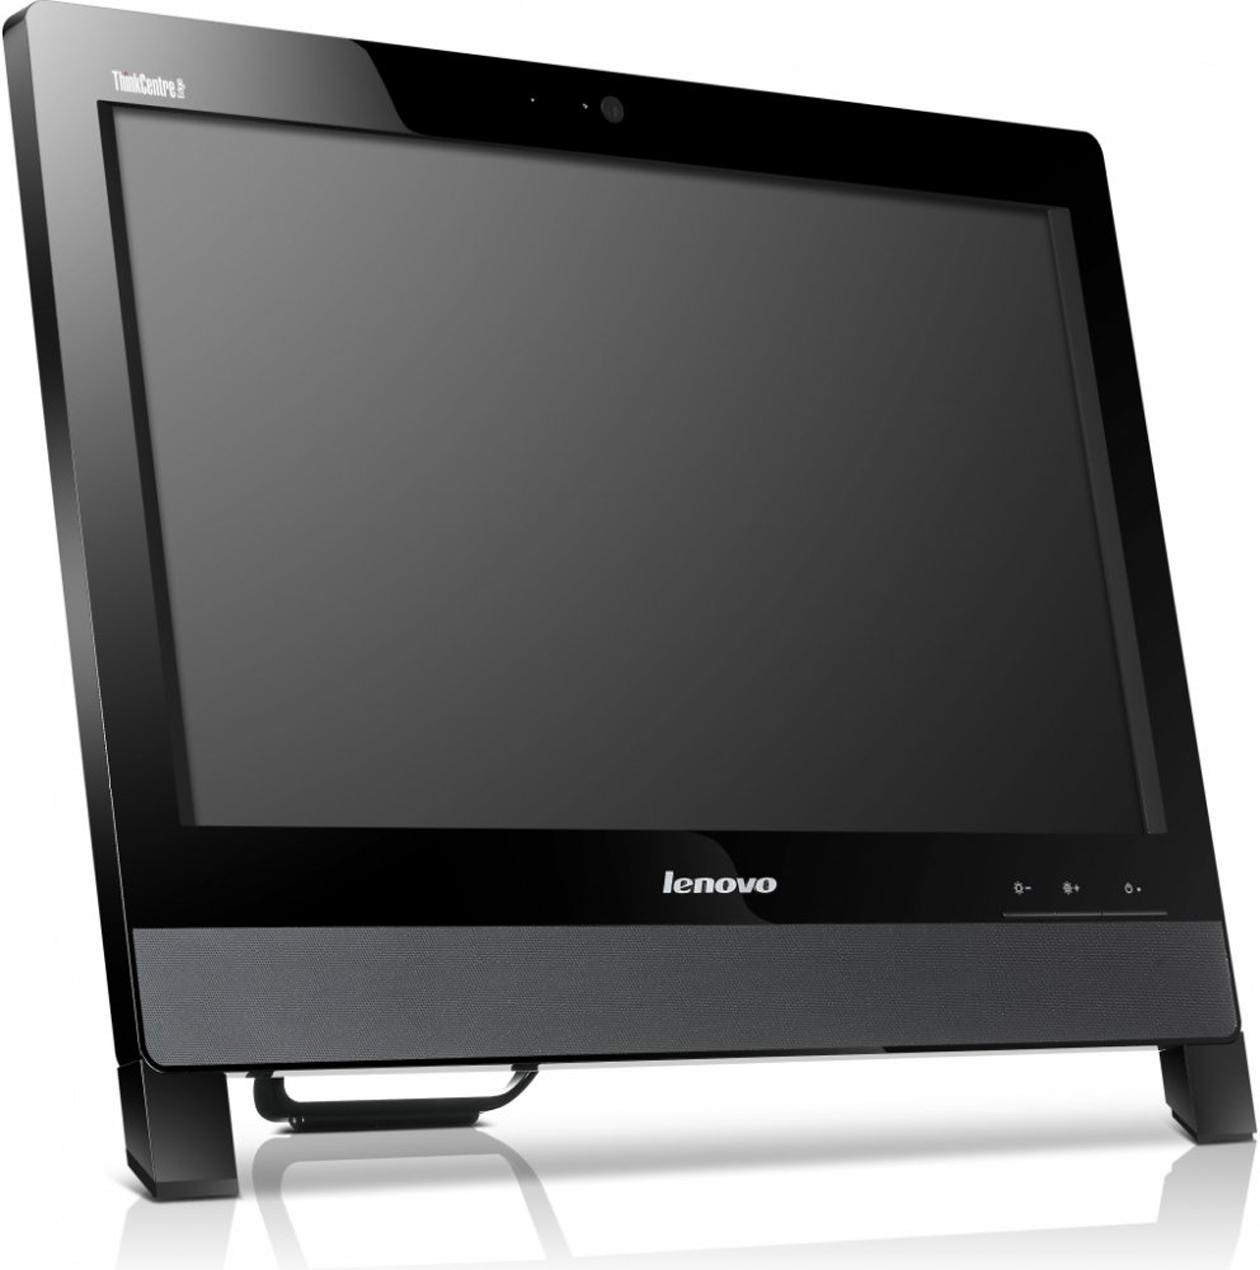 Harga Lenovo